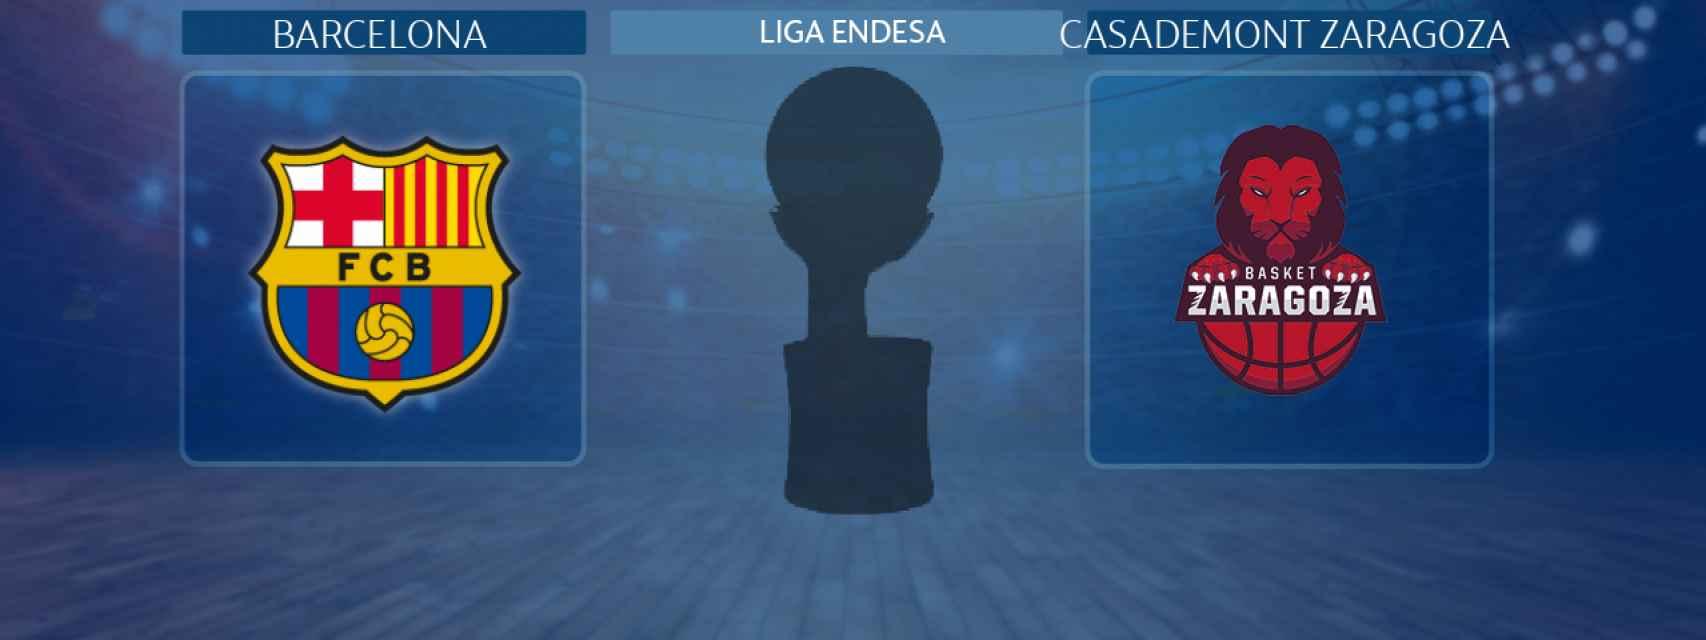 Barcelona - Casademont Zaragoza, partido de la Liga Endesa